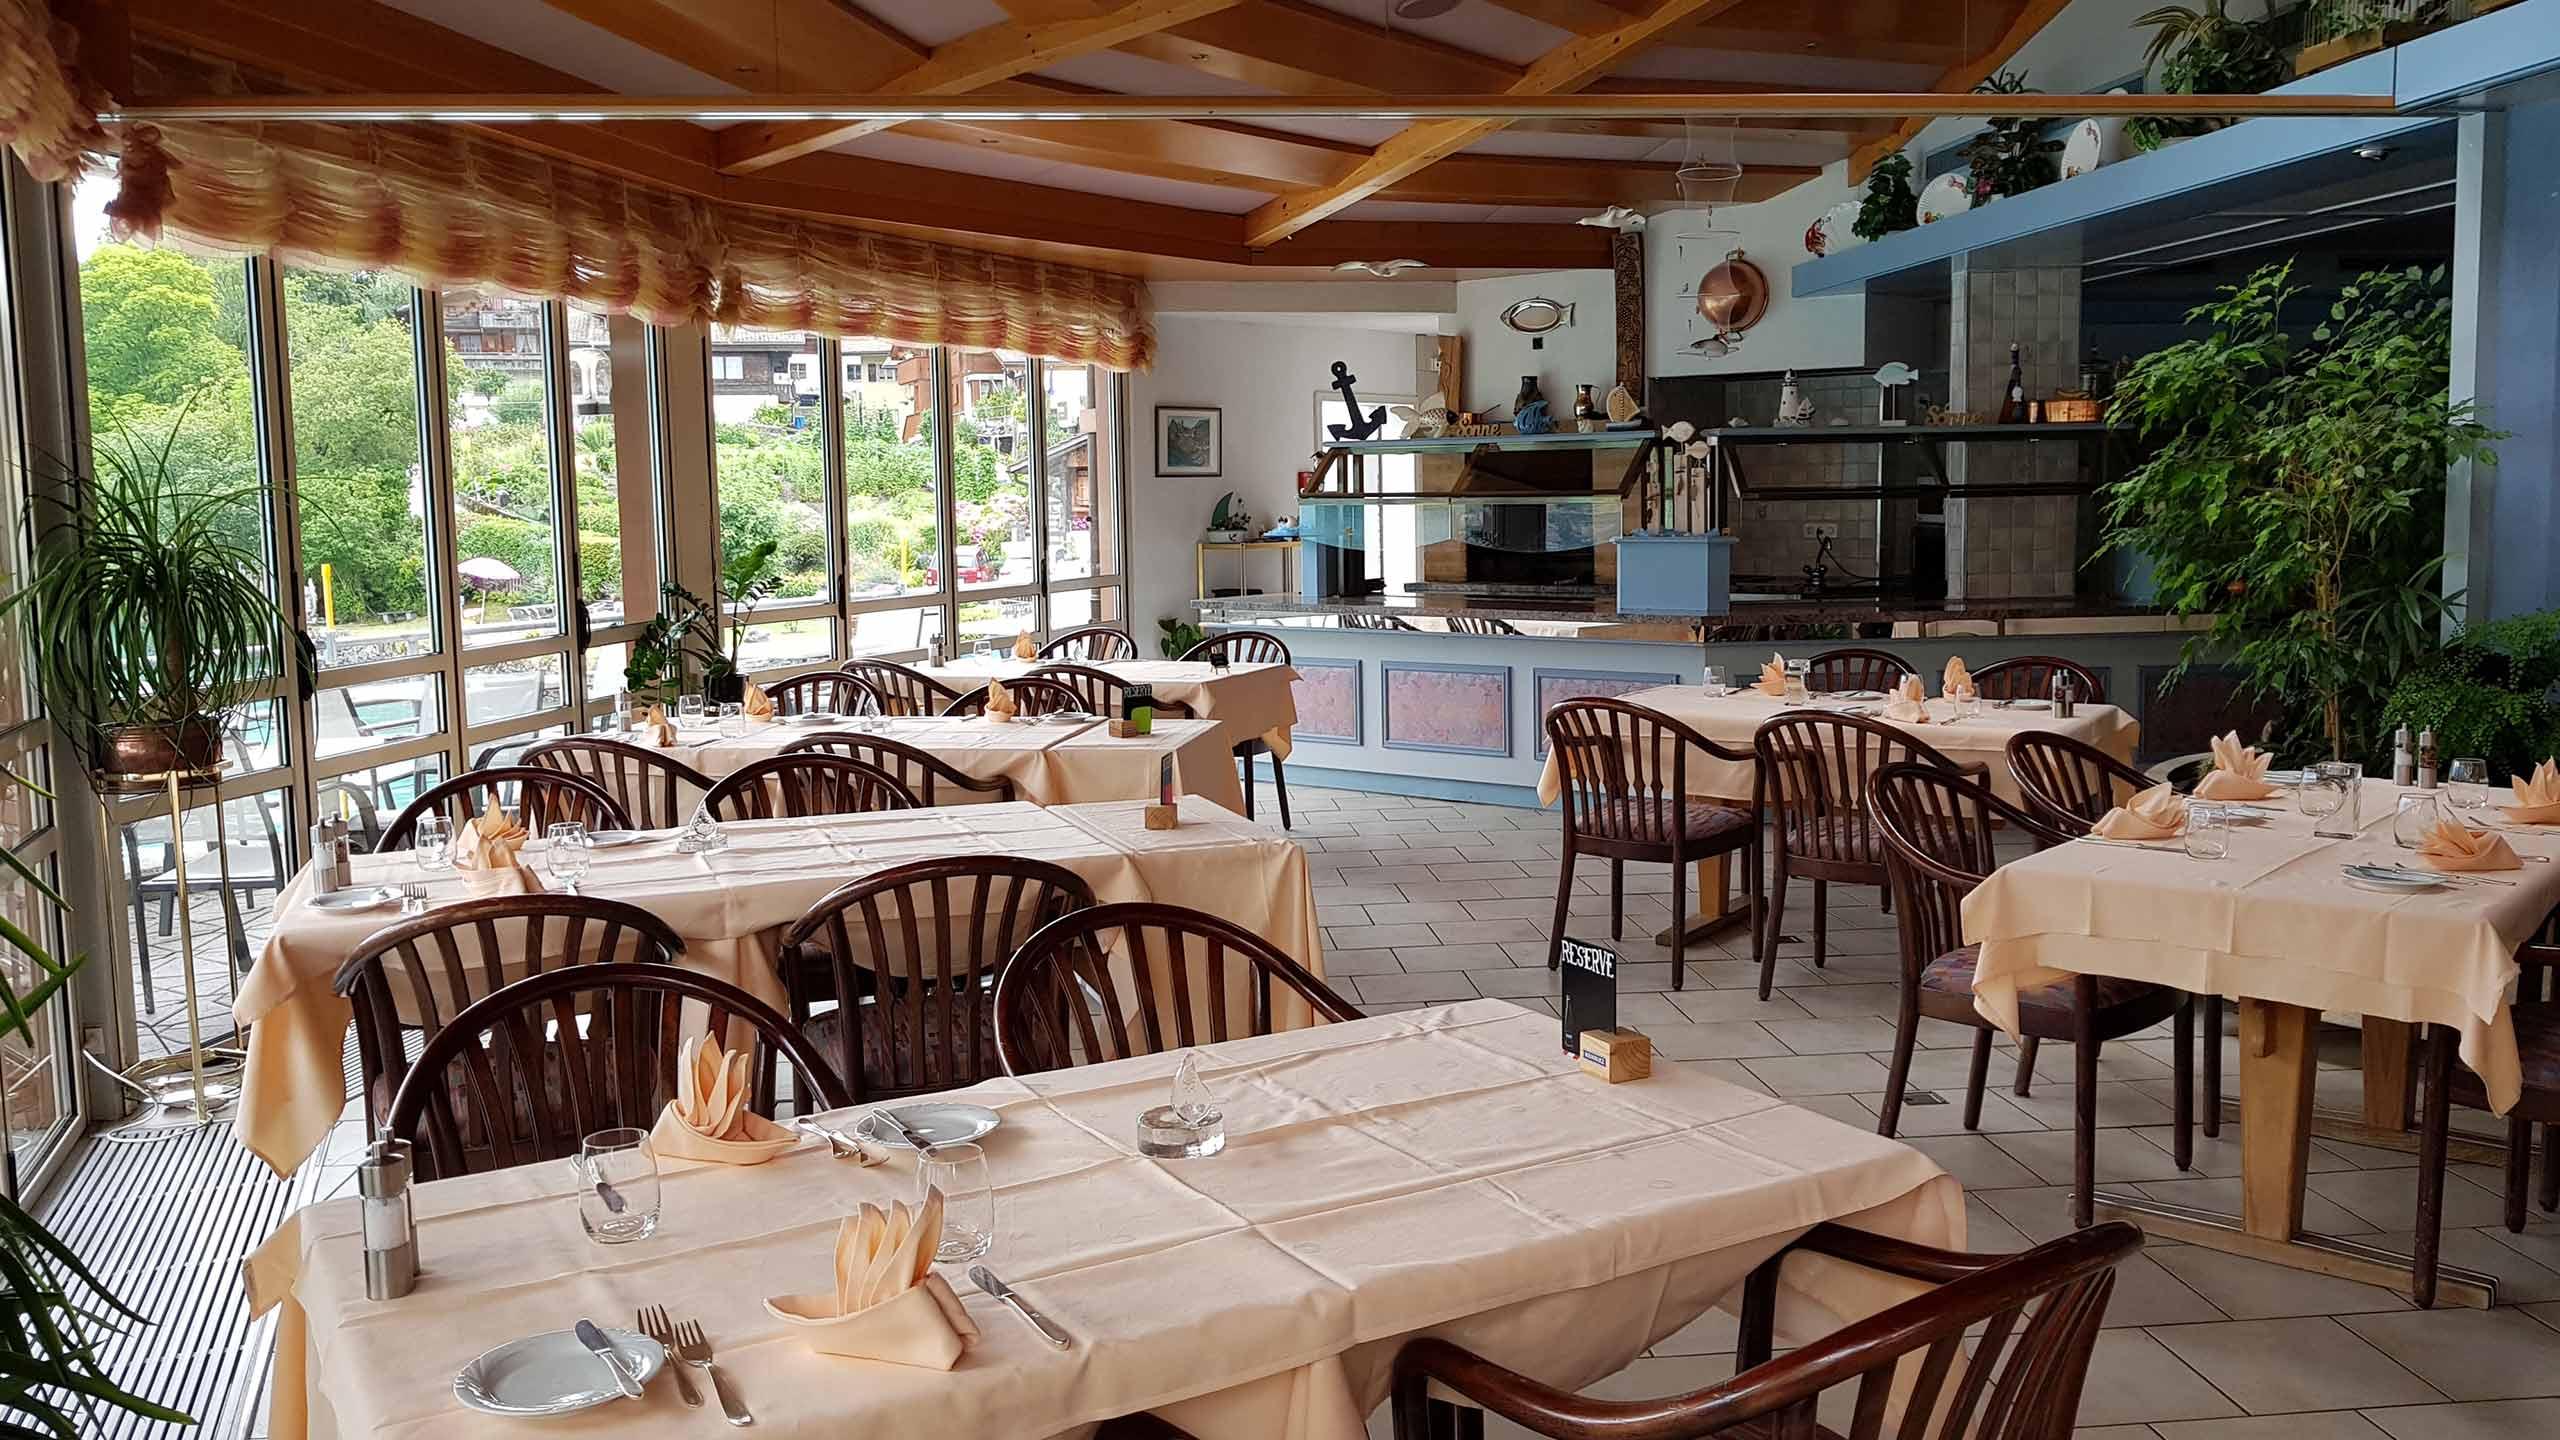 strandhotel-iseltwald-tische-gaststube-see-grill.jpg